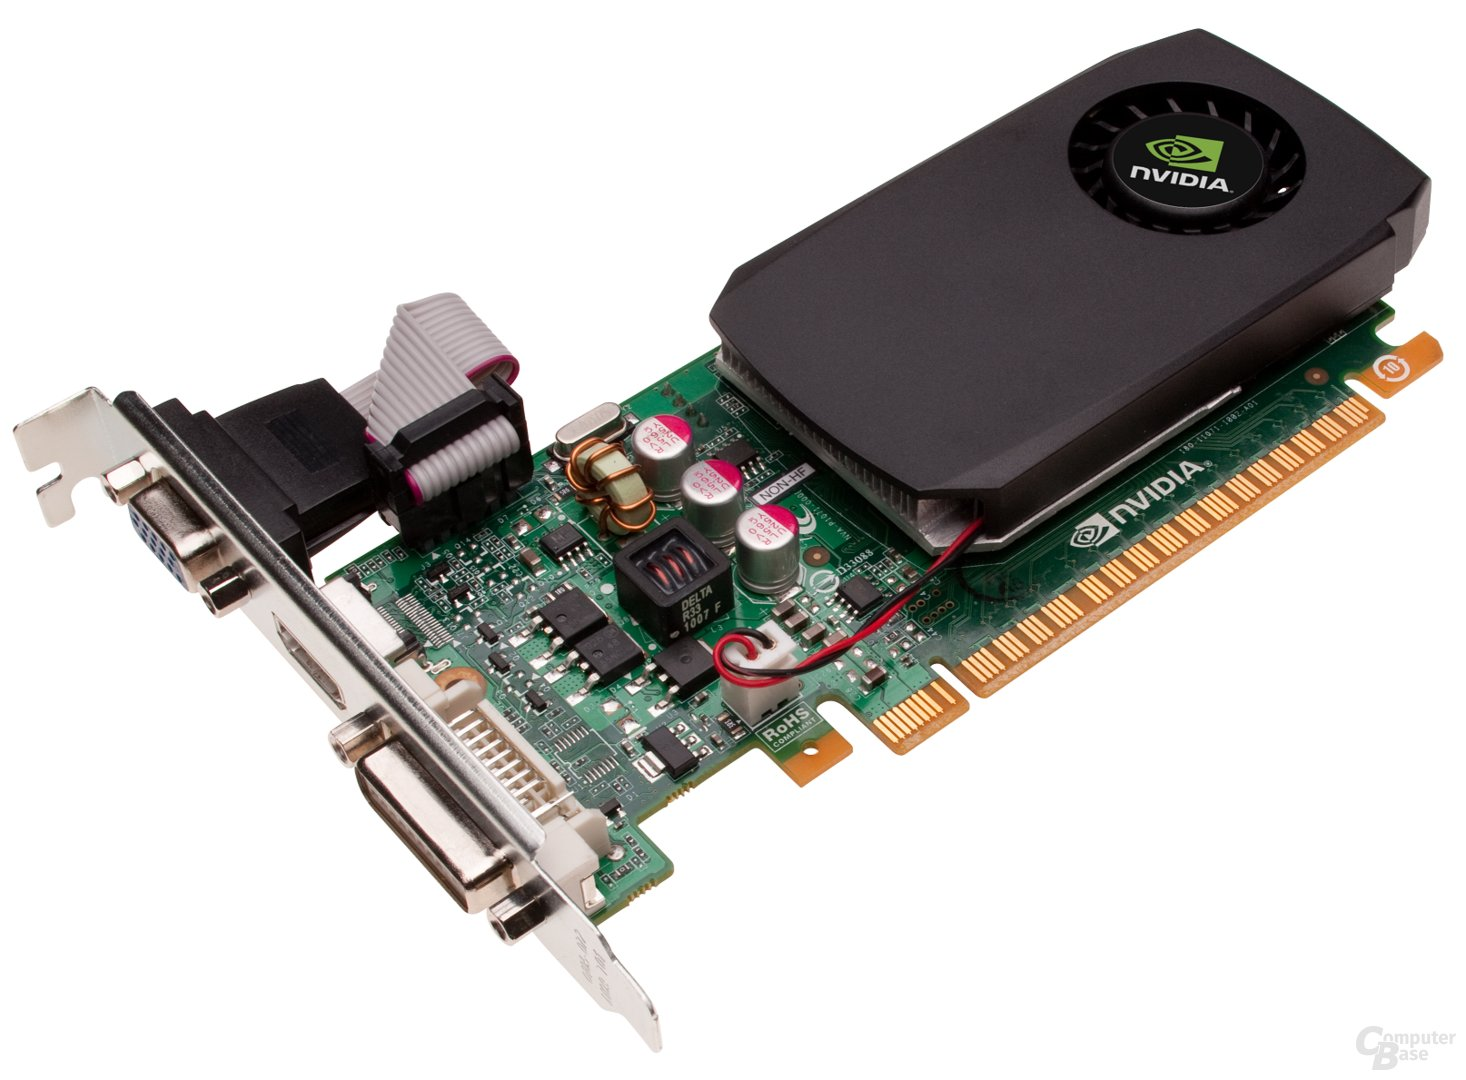 Nvidia GeForce GT 530